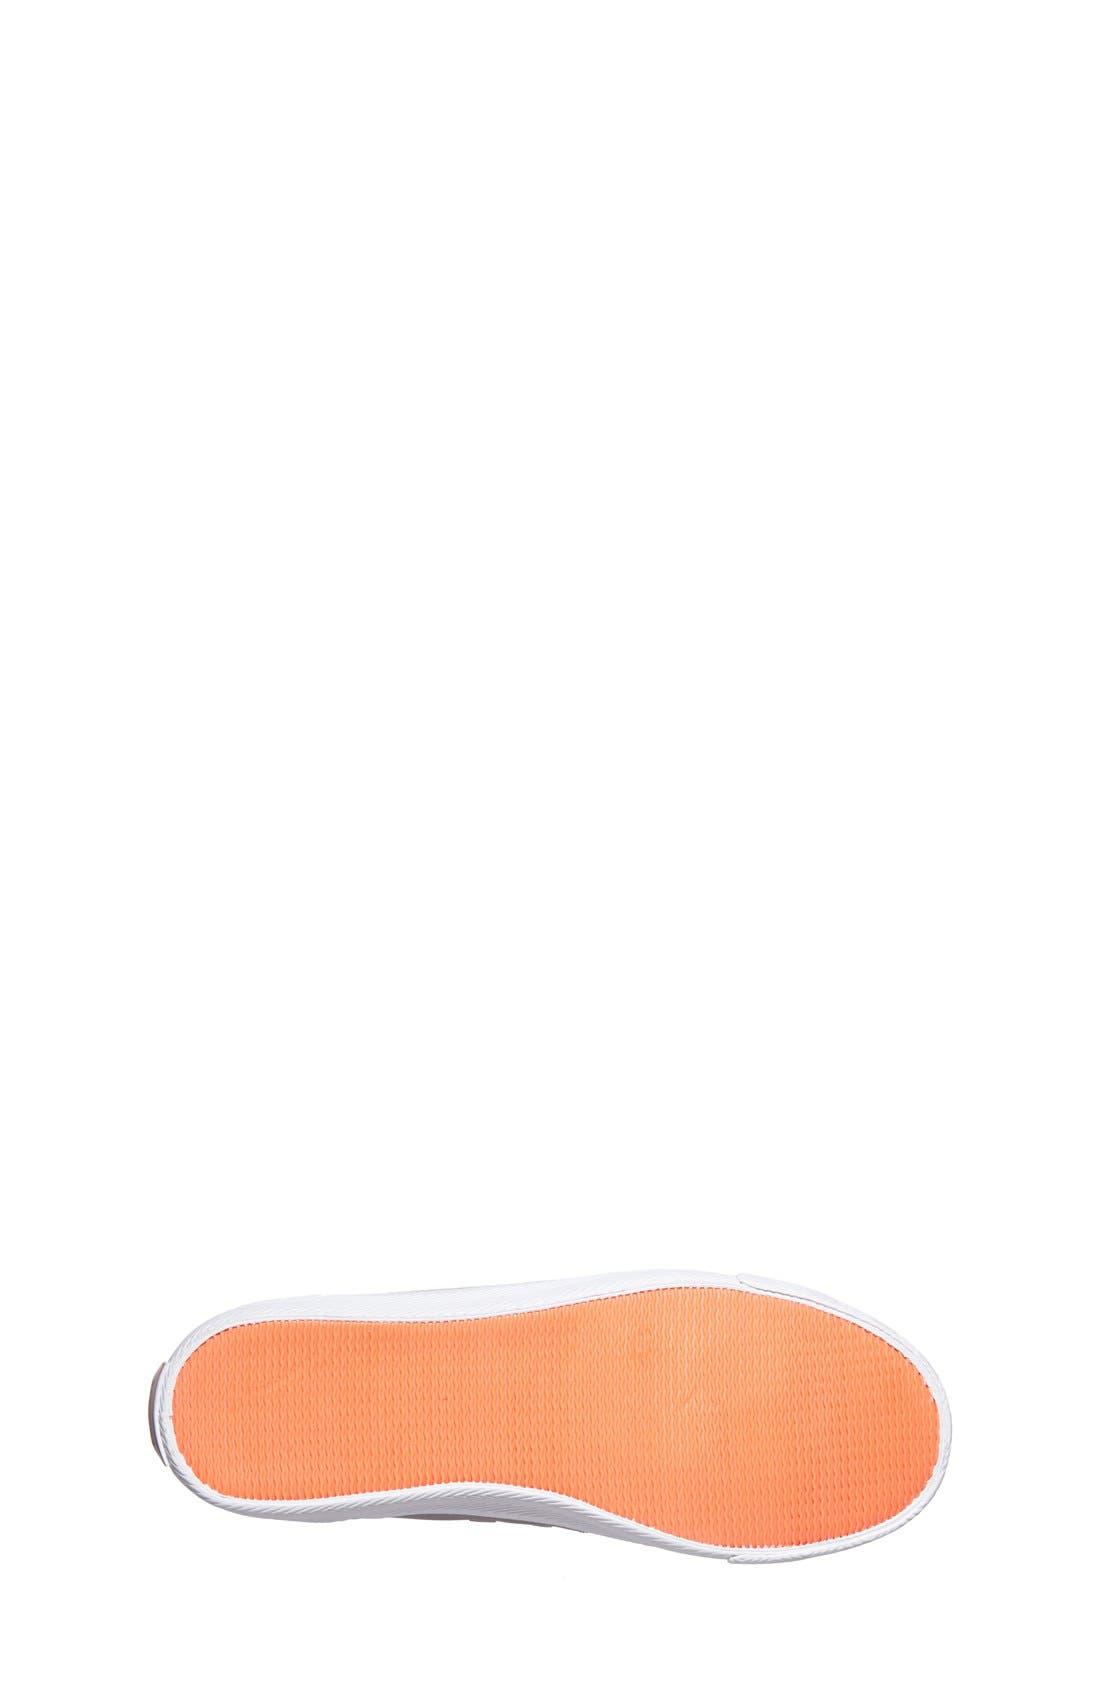 Alternate Image 4  - Lacoste 'Marcel' Sneaker (Toddler, Little Kid & Big Kid)